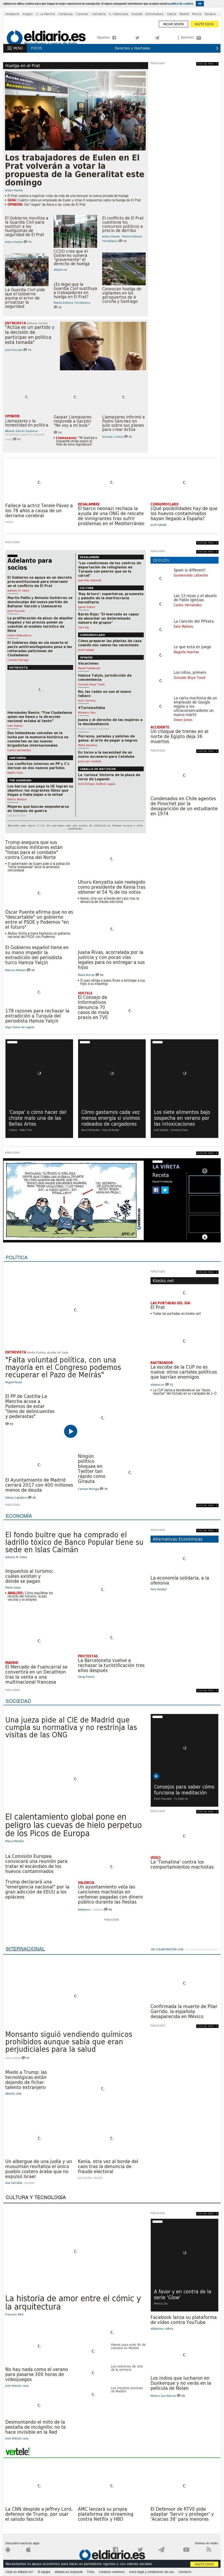 El Diario at Saturday Aug. 12, 2017, 2:03 a.m. UTC